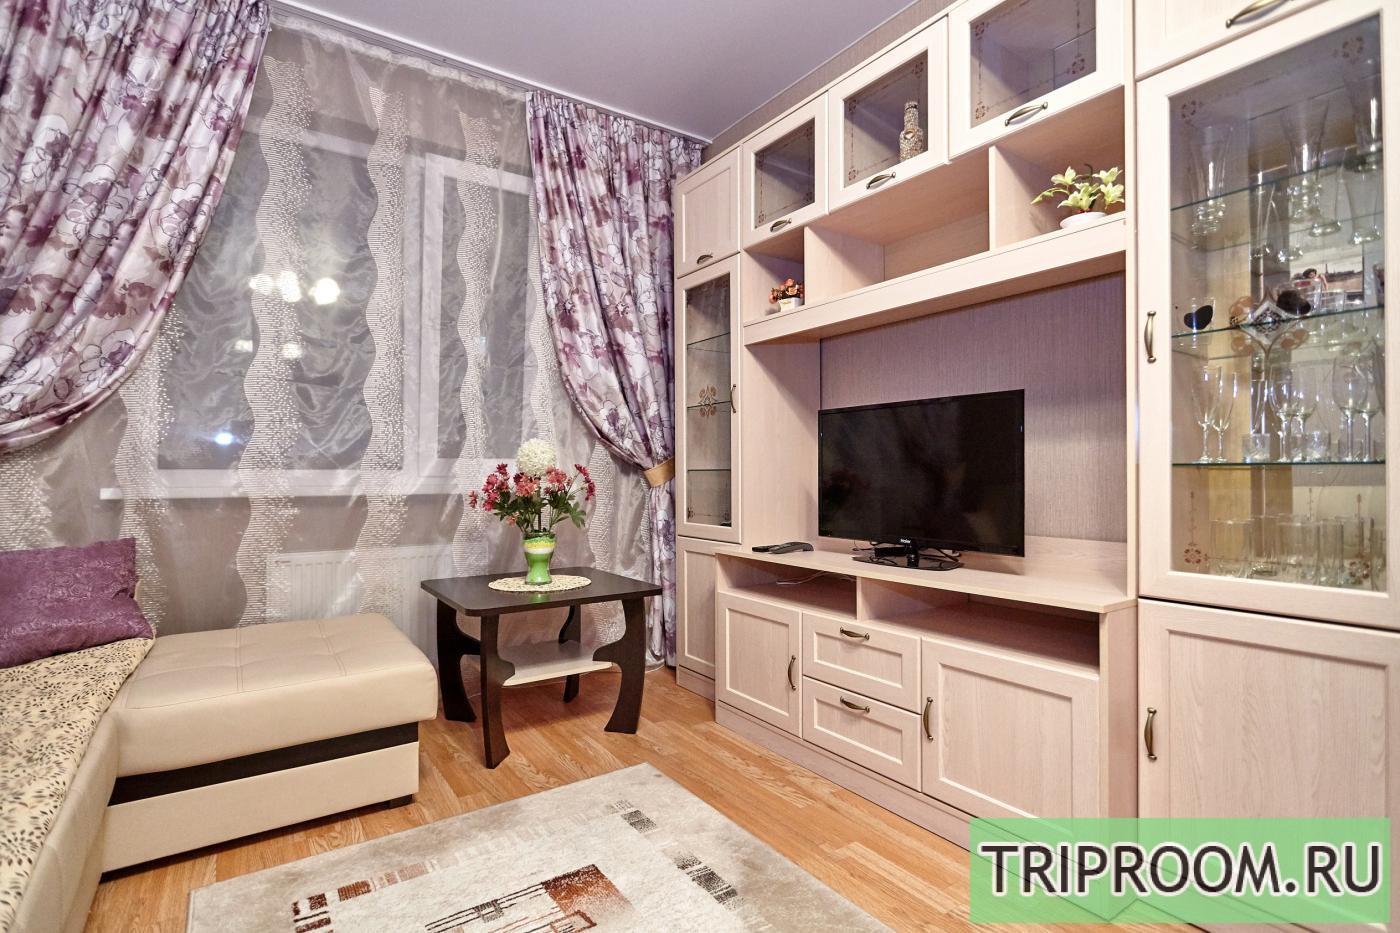 1-комнатная квартира посуточно (вариант № 6860), ул. Соколова улица, фото № 2